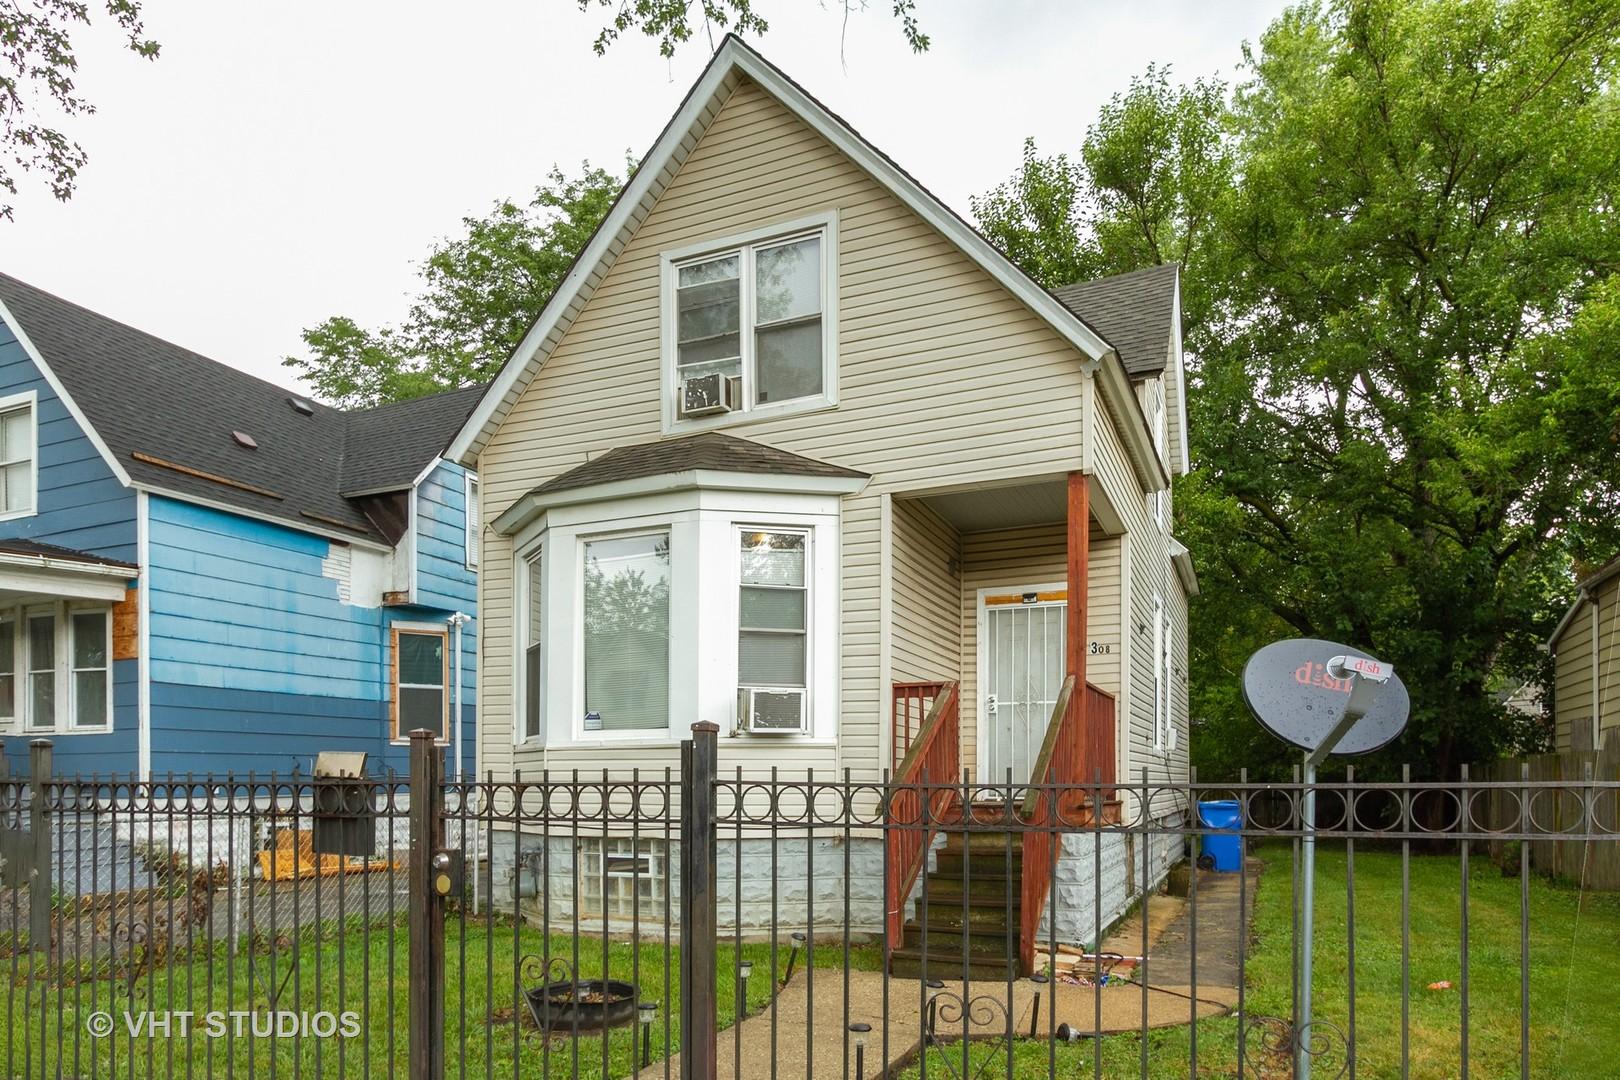 308 W 106th Place, Chicago IL 60628